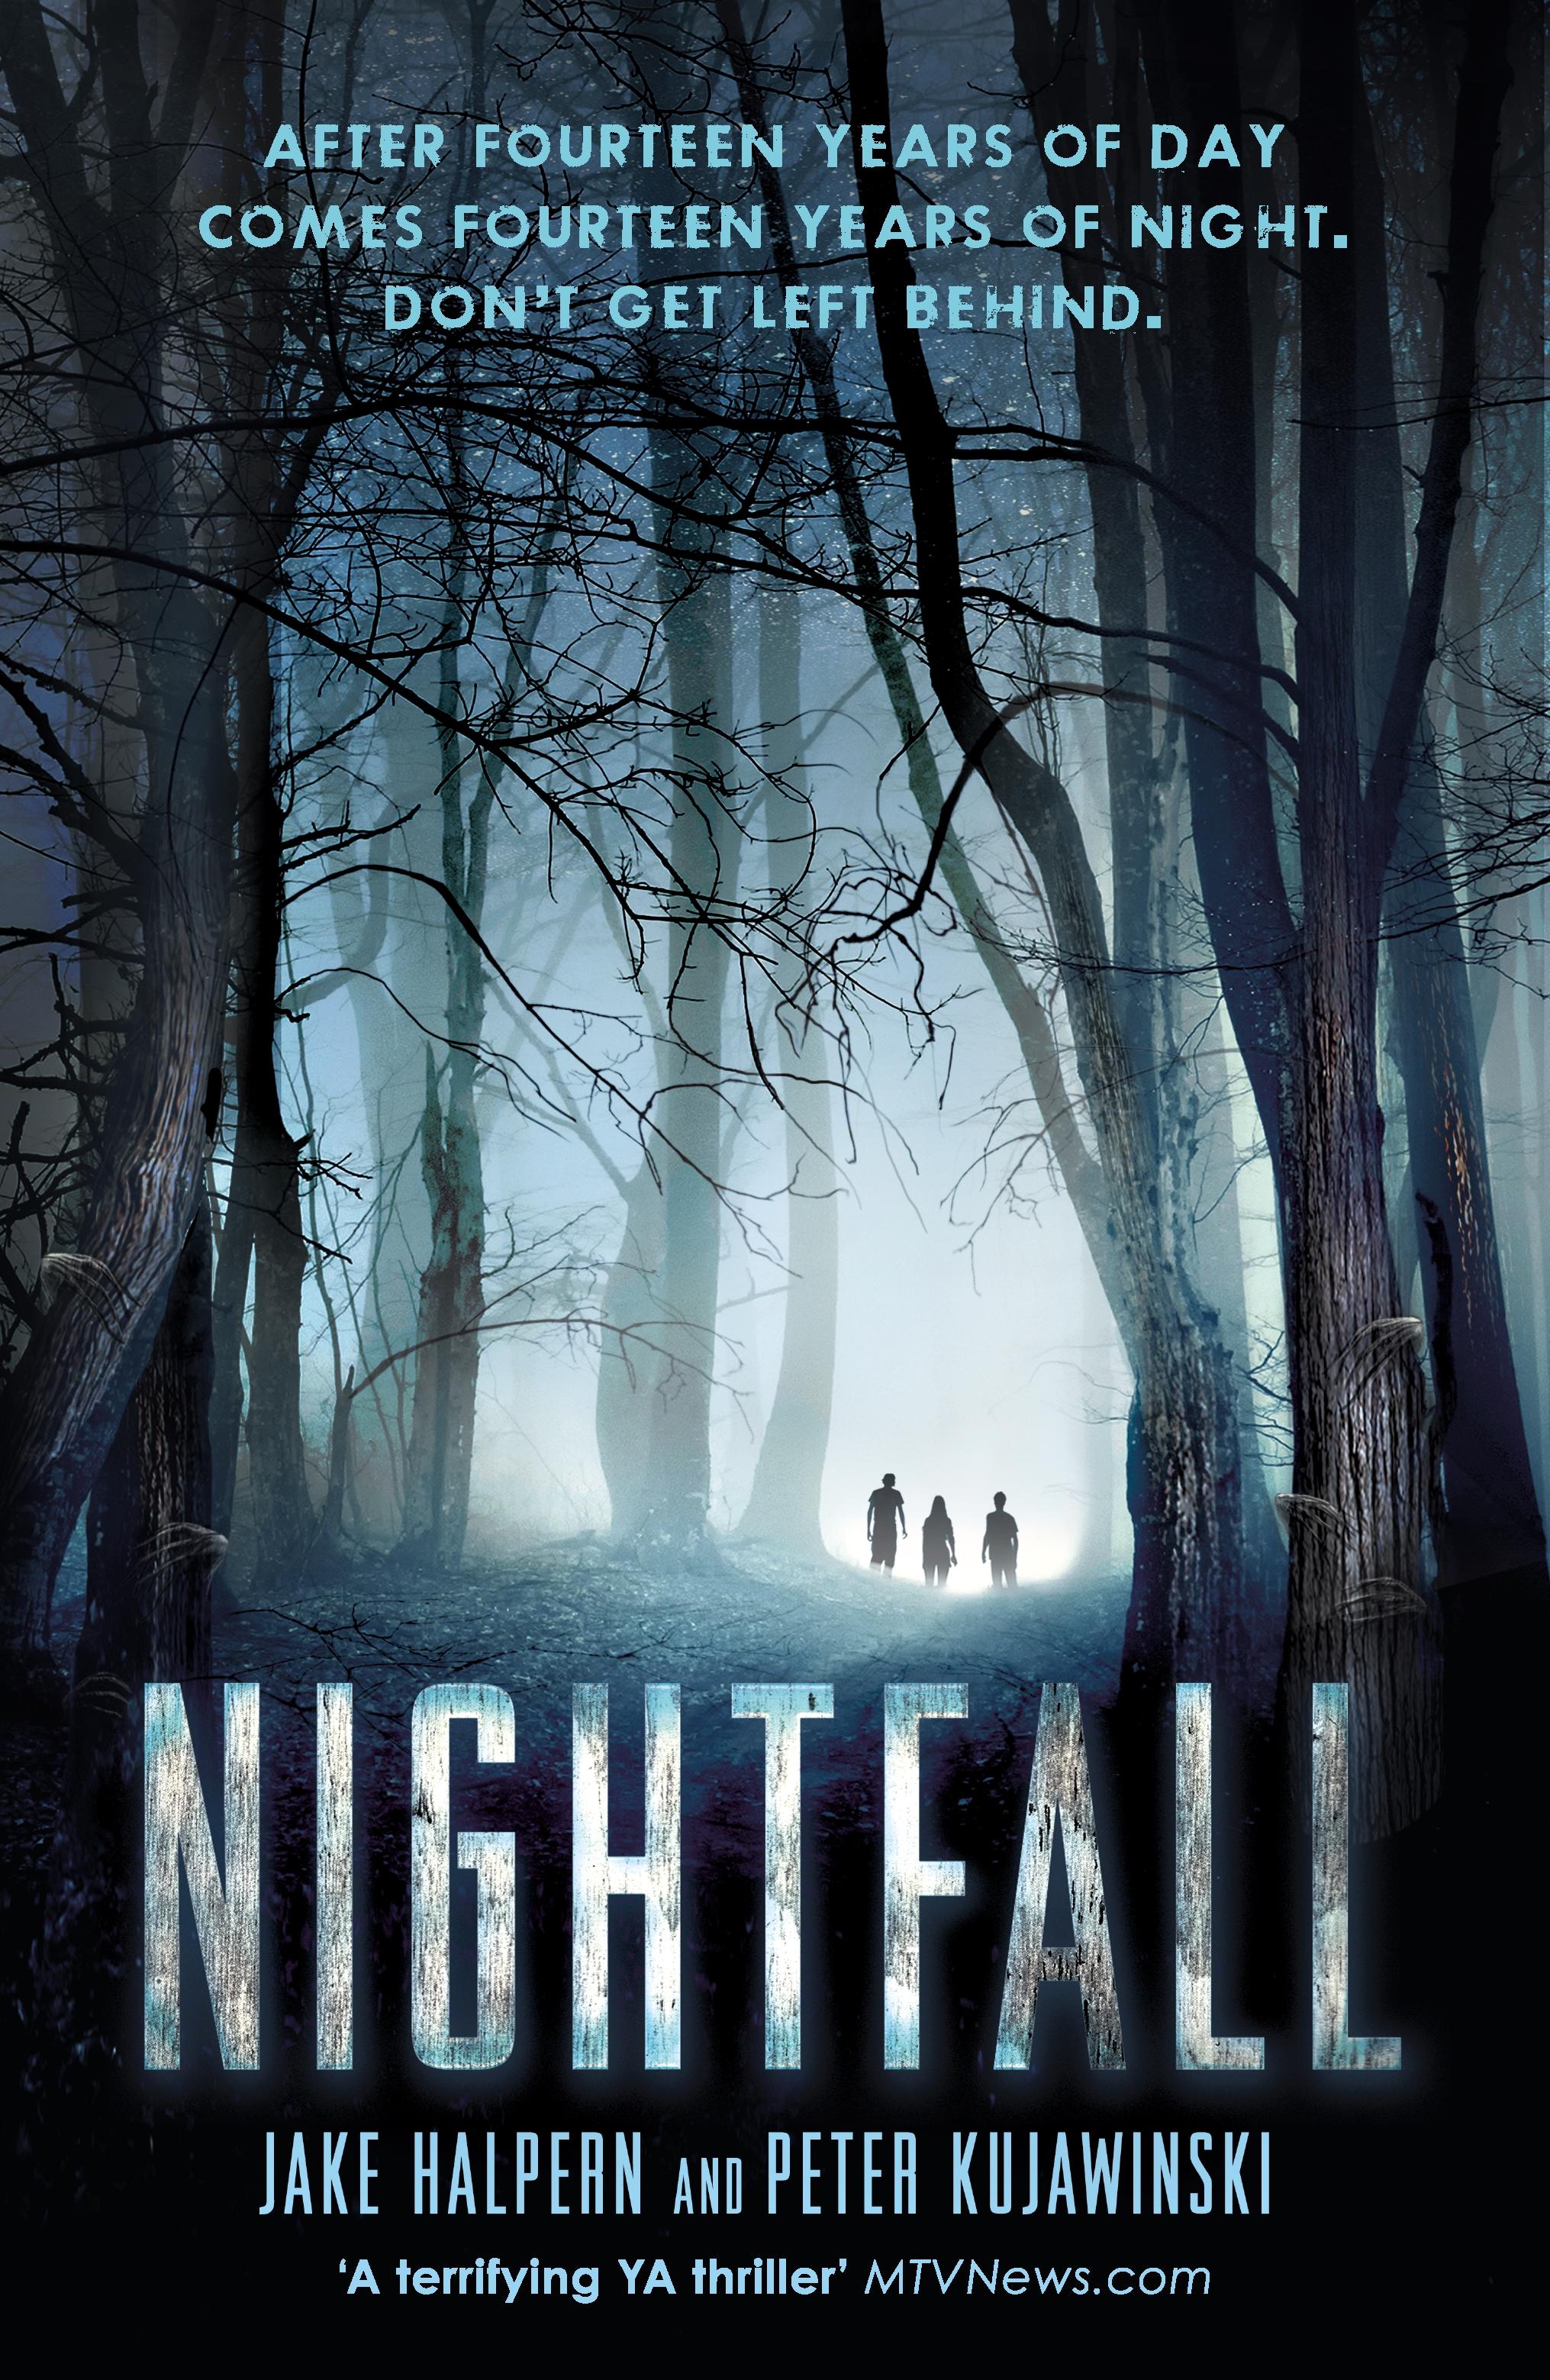 Nightfall by Jake HalpernPeter Kujawinski